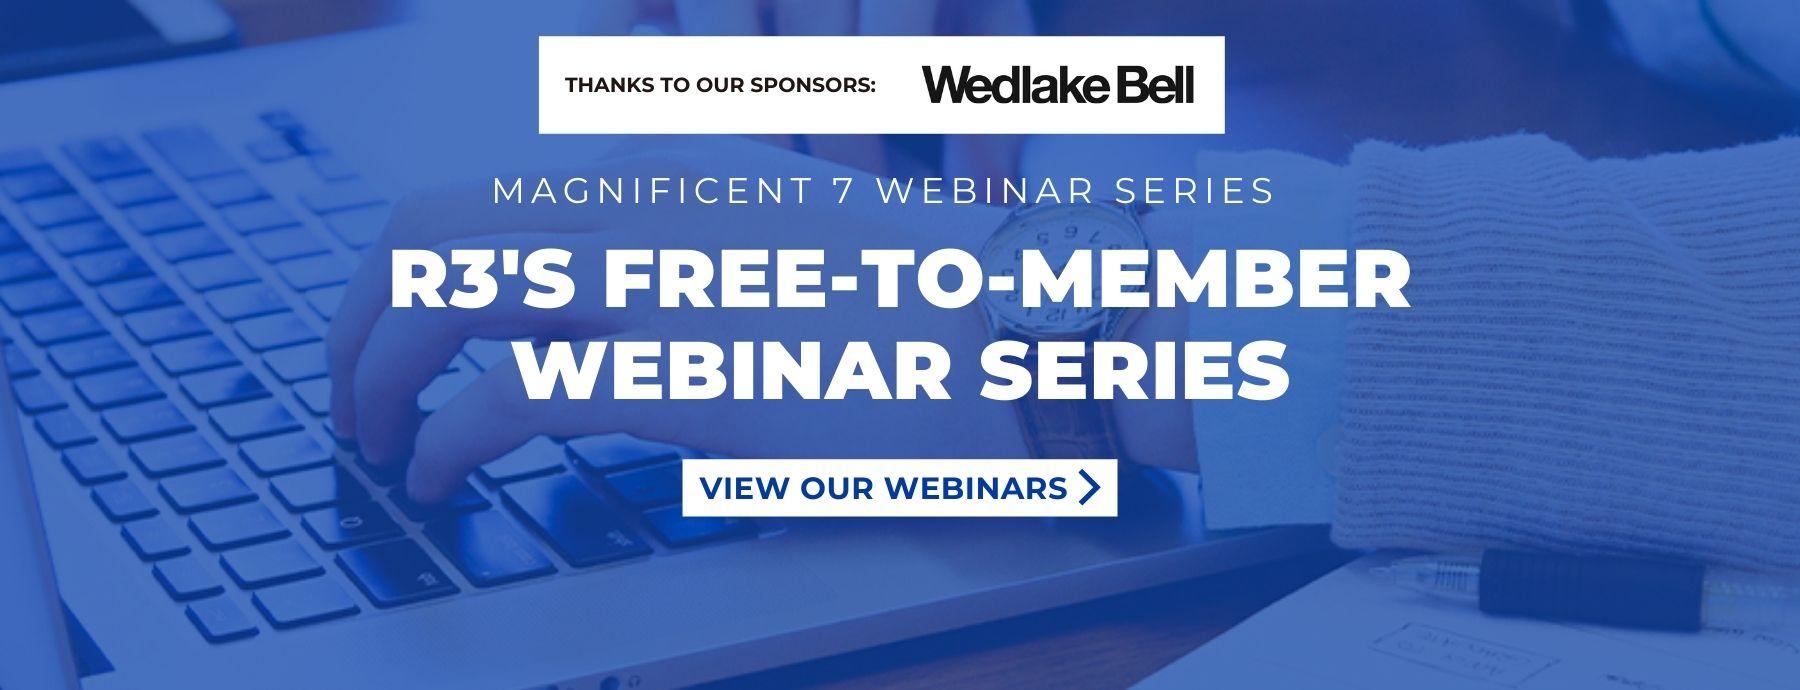 Magnificent 7 Webinar Series